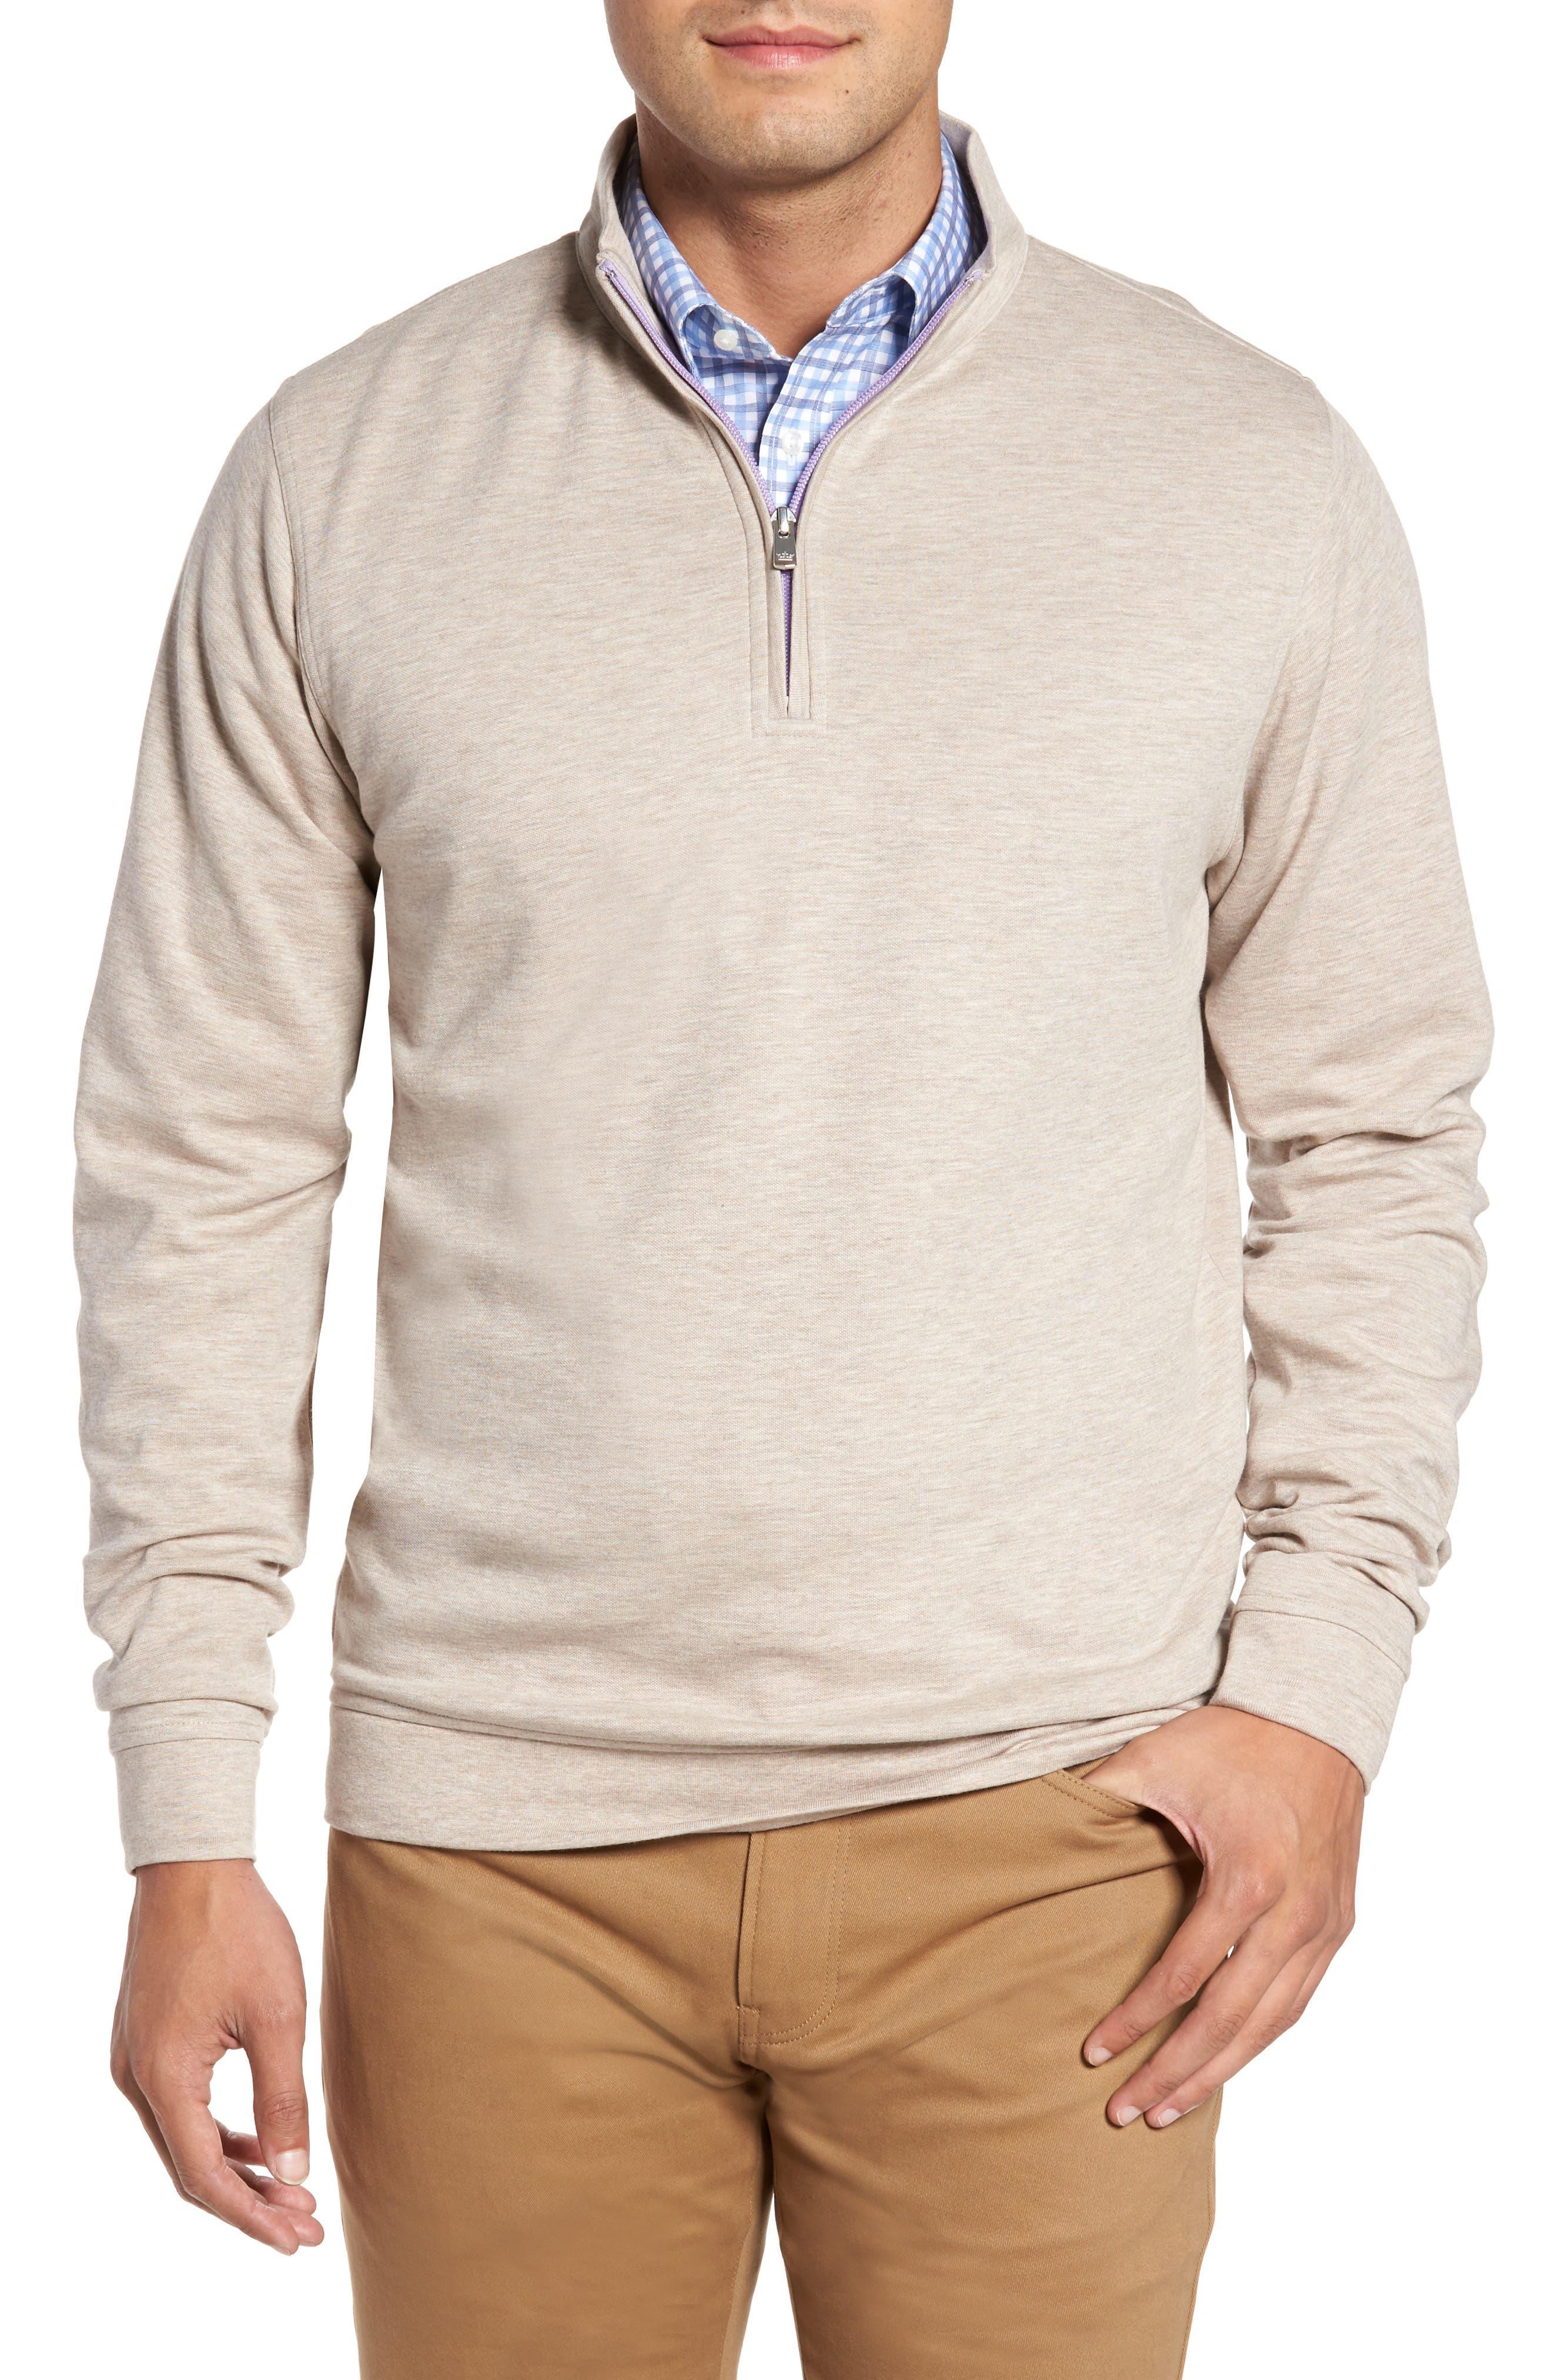 Alternate Image 1 Selected - Peter Millar Crown Comfort Jersey Quarter Zip Pullover